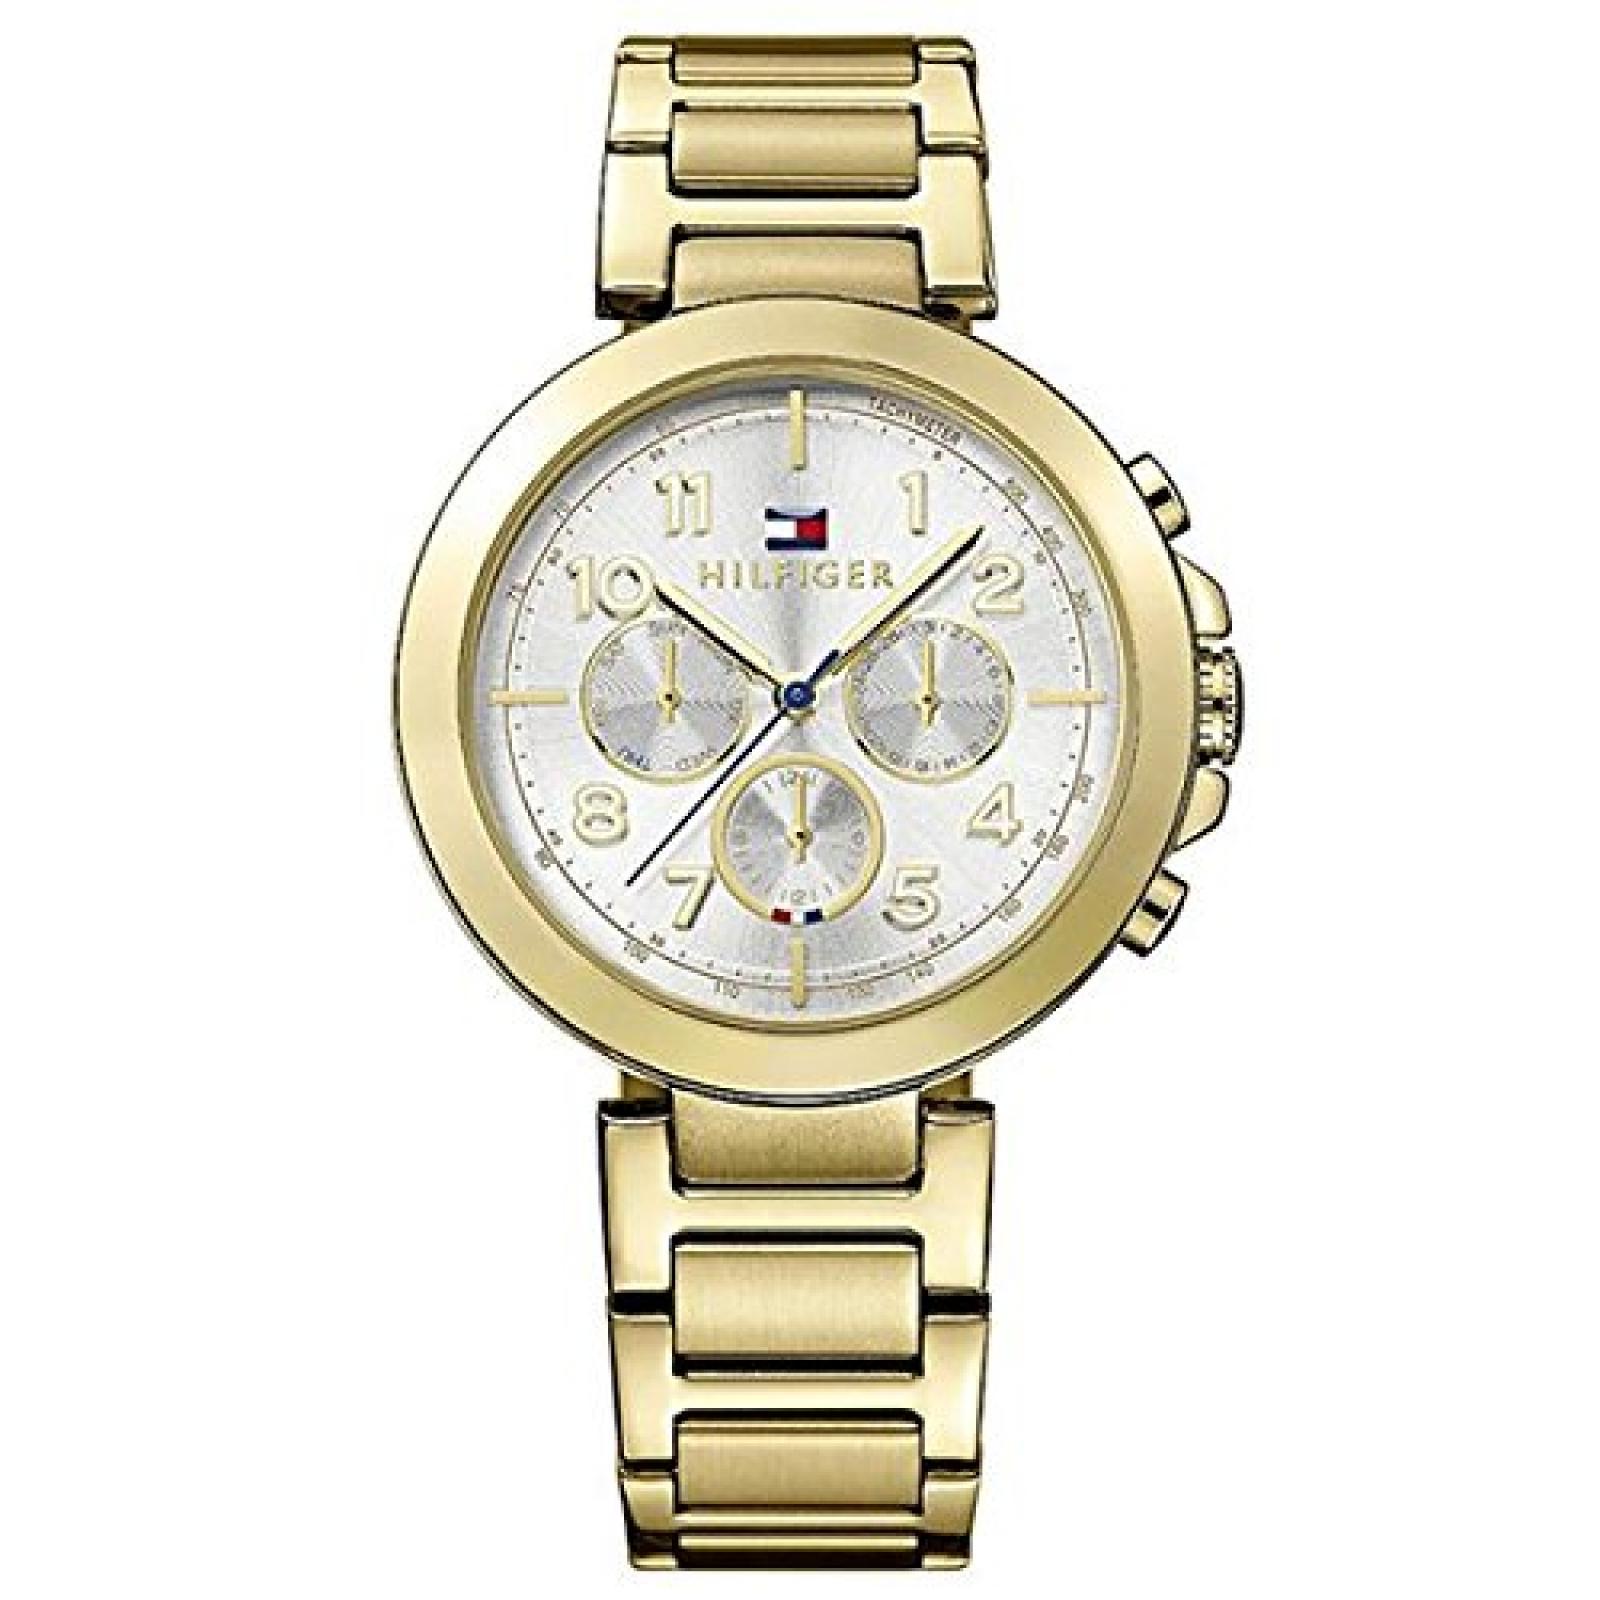 Tommy Hilfiger 1781450 CARY Uhr Damenuhr Edelstahl 50m Analog Datum gold